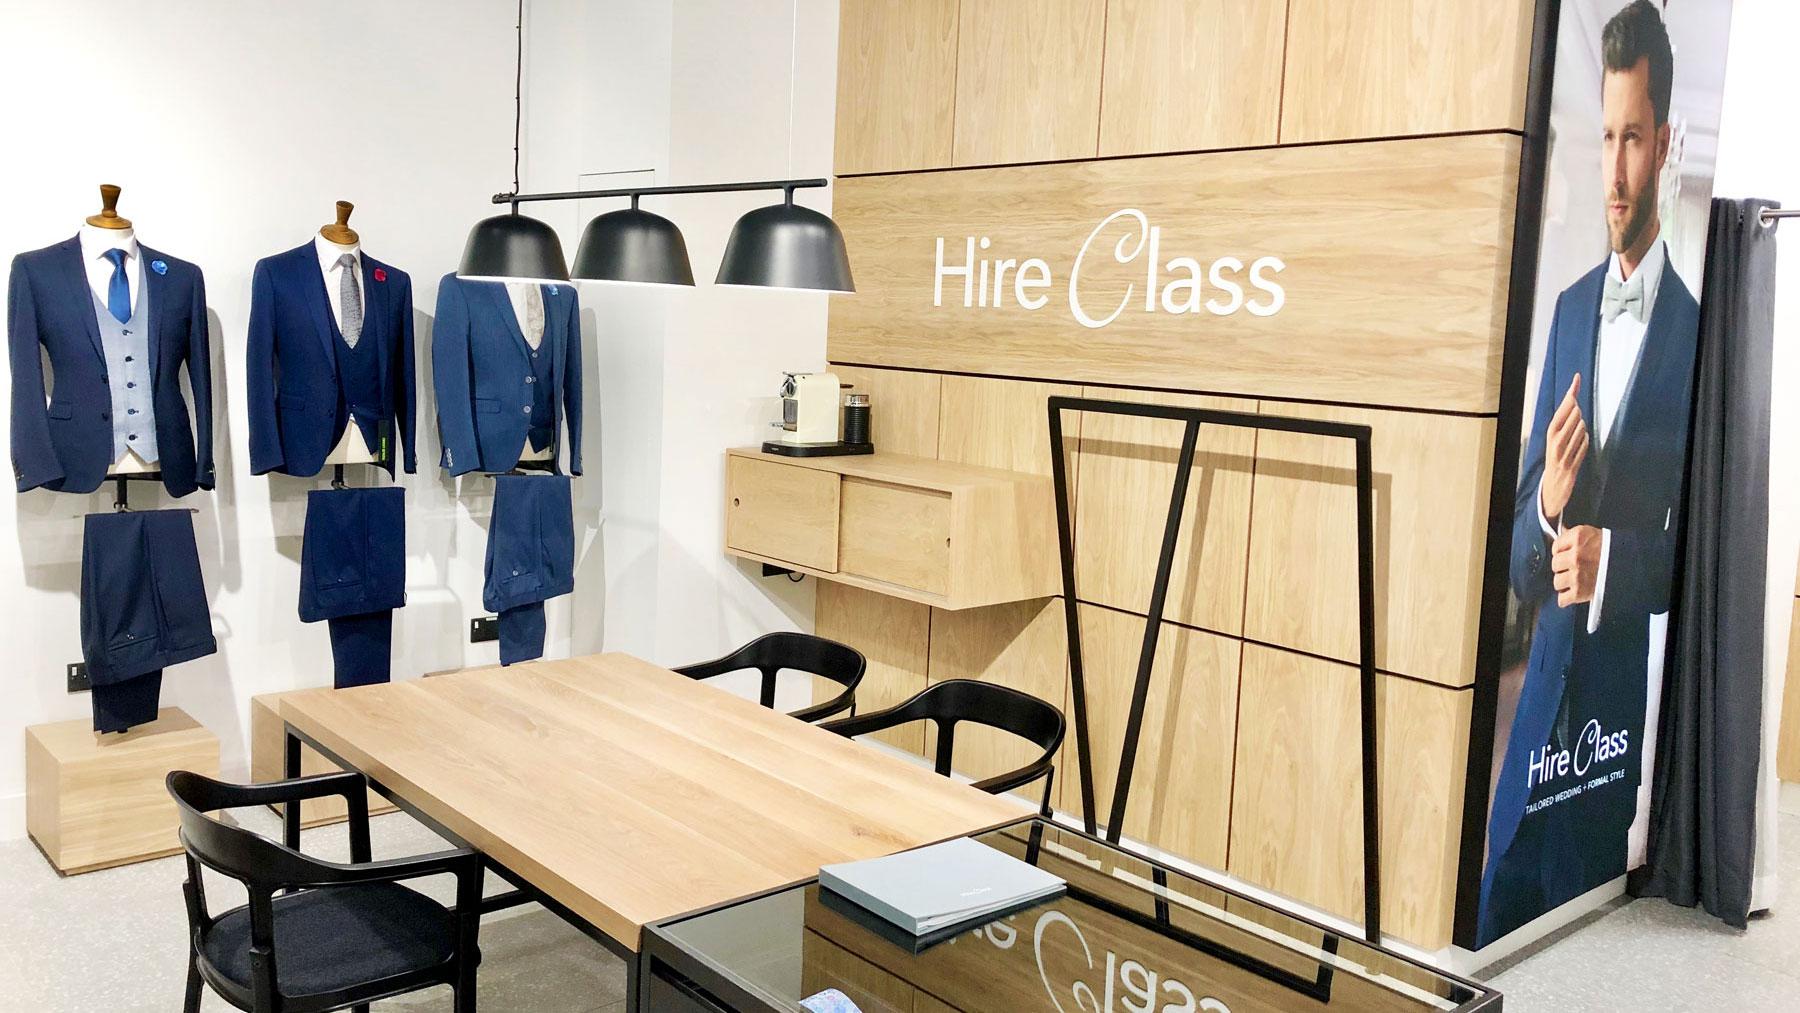 Hire Class unveils new concept store